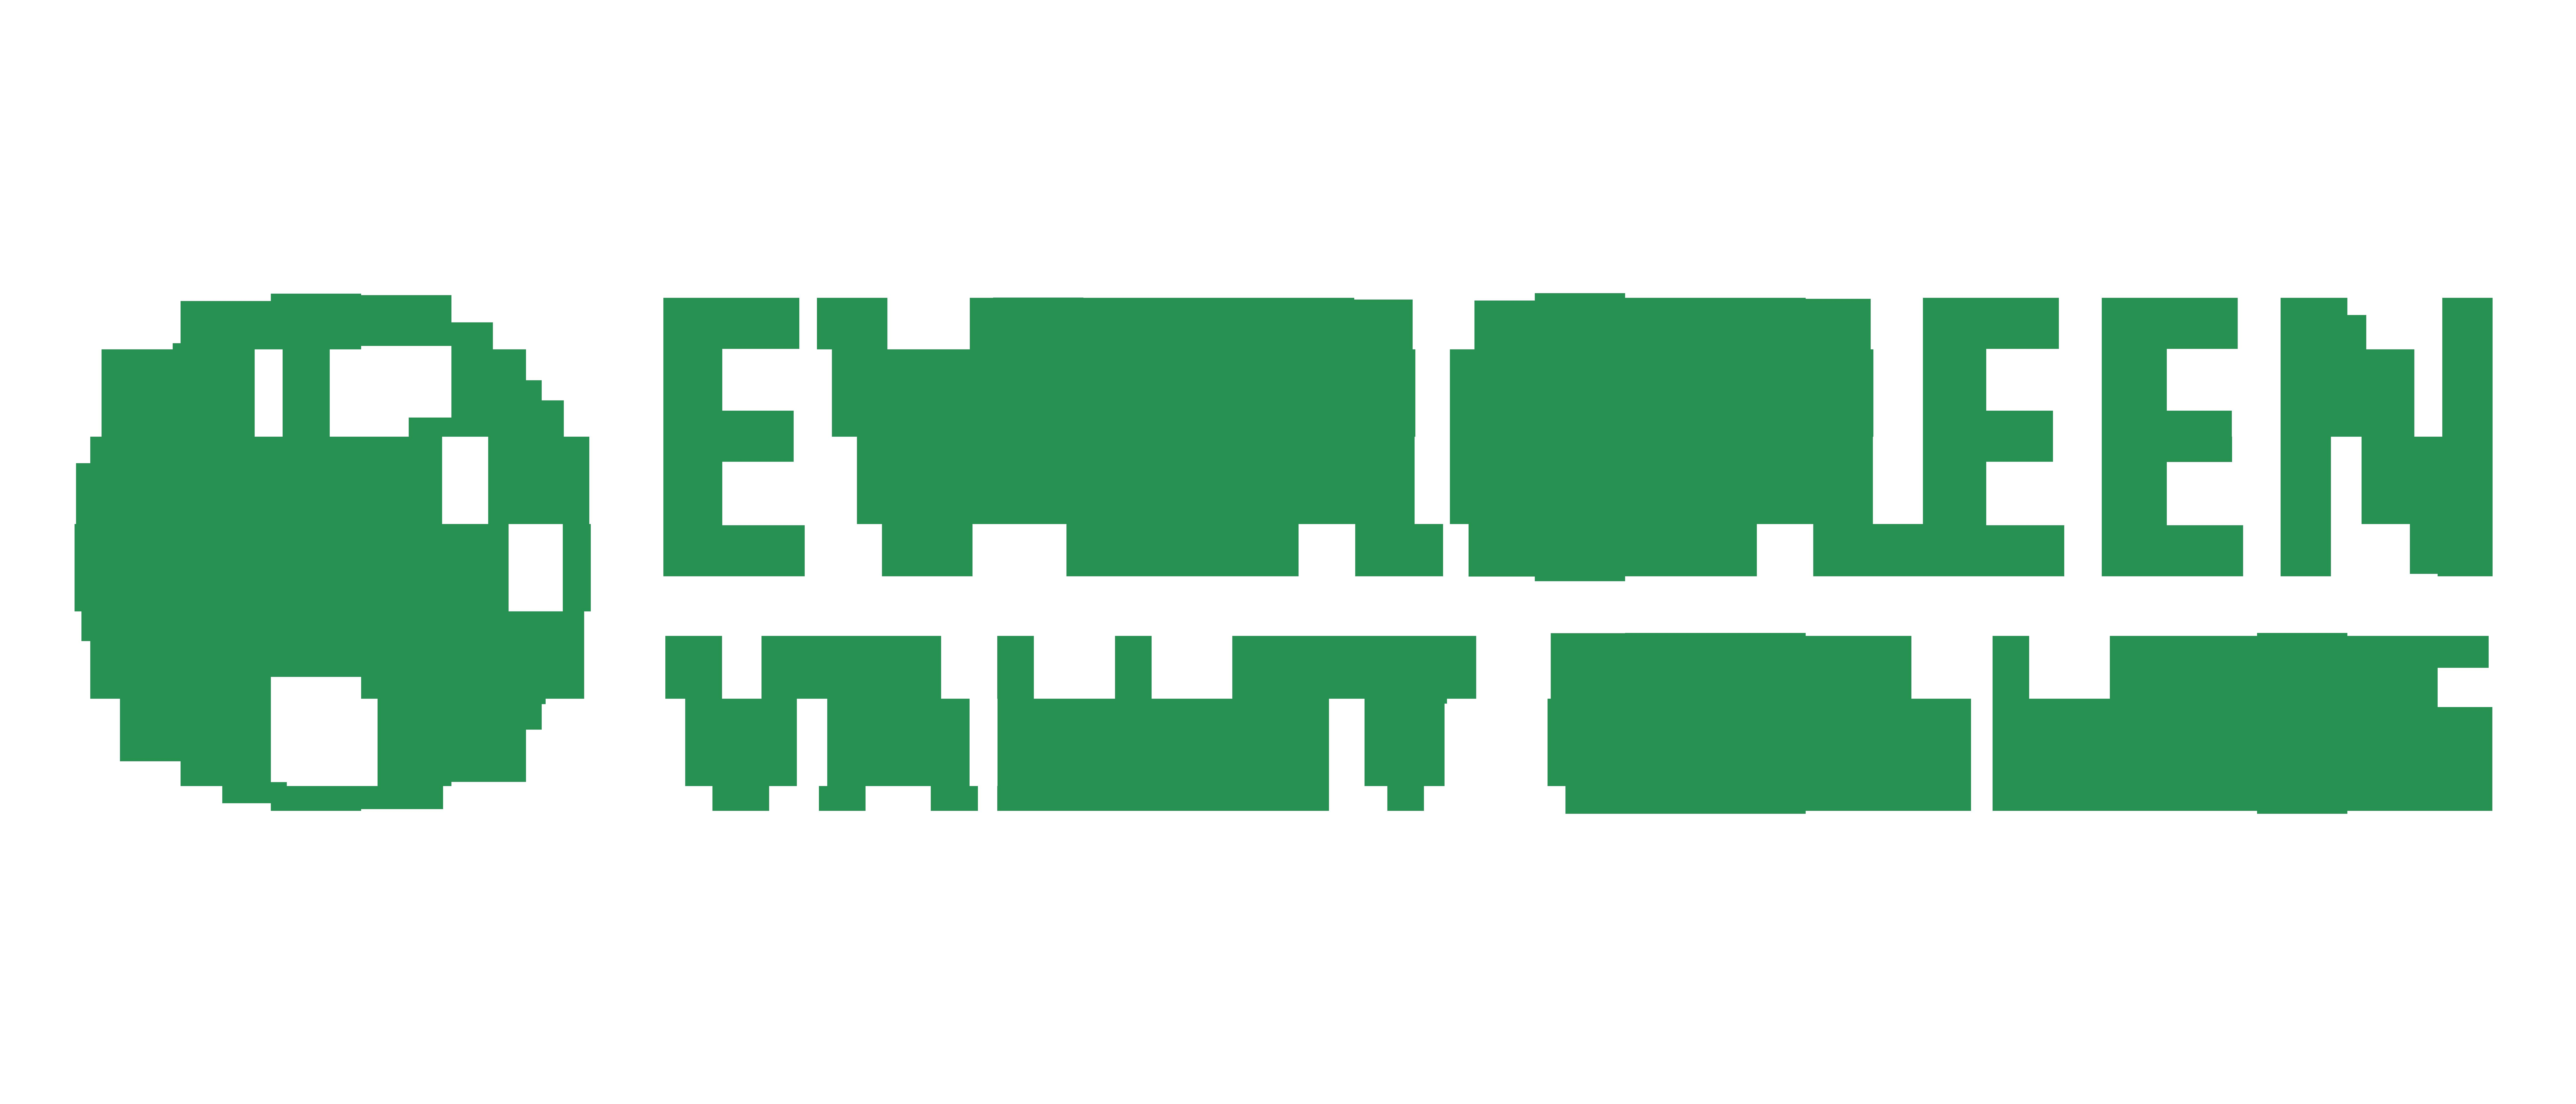 Evergreen Valley College - Wikipedia